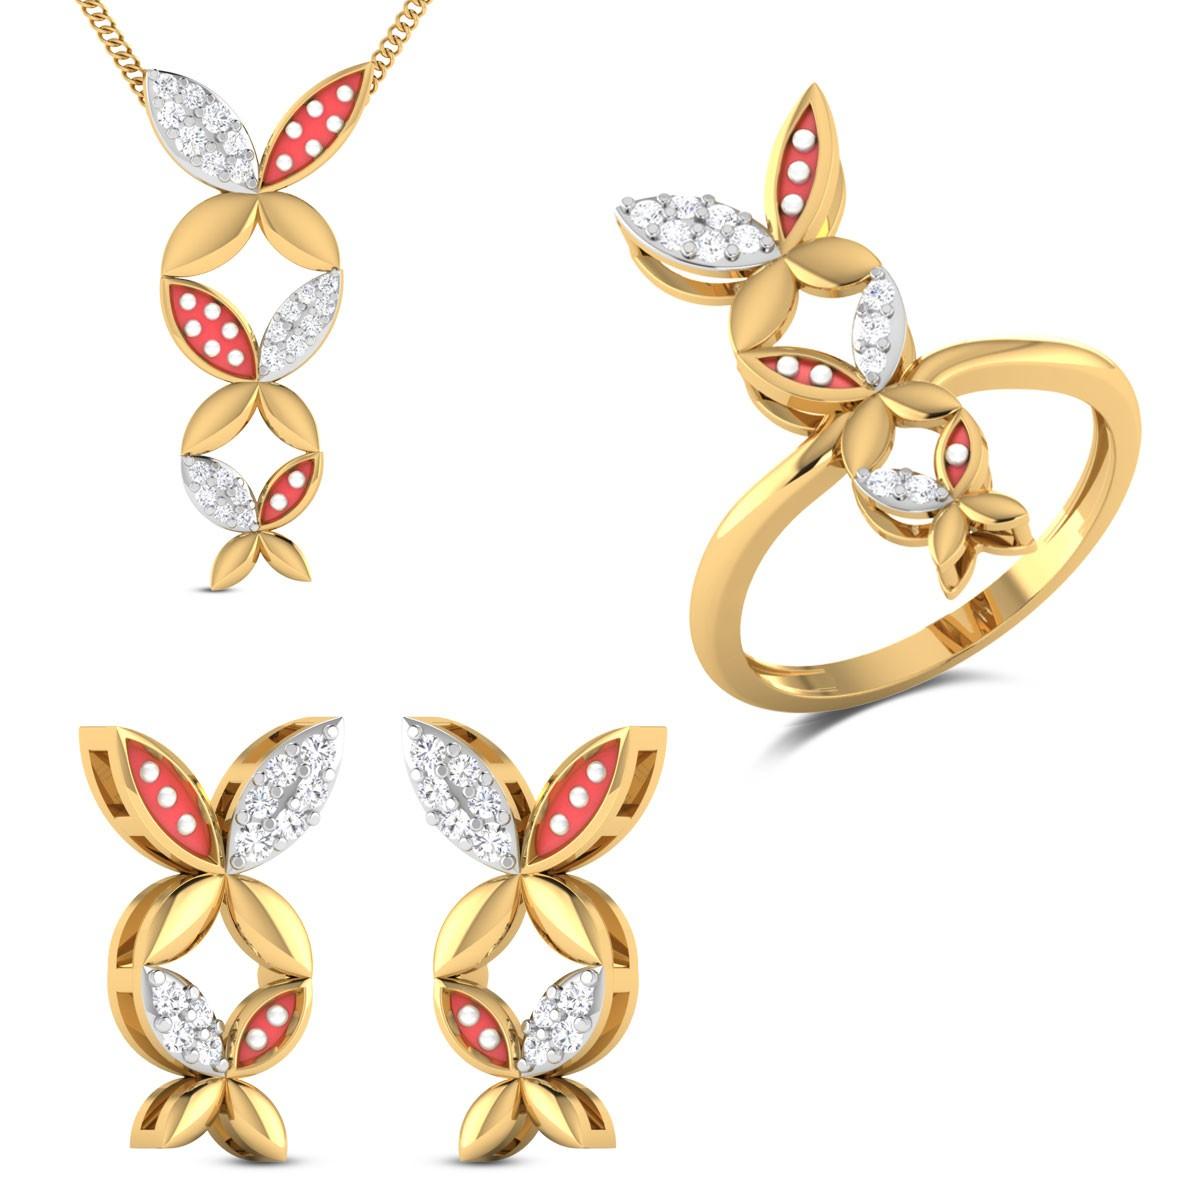 Olivia Yellow Gold Diamond Jewellery Set